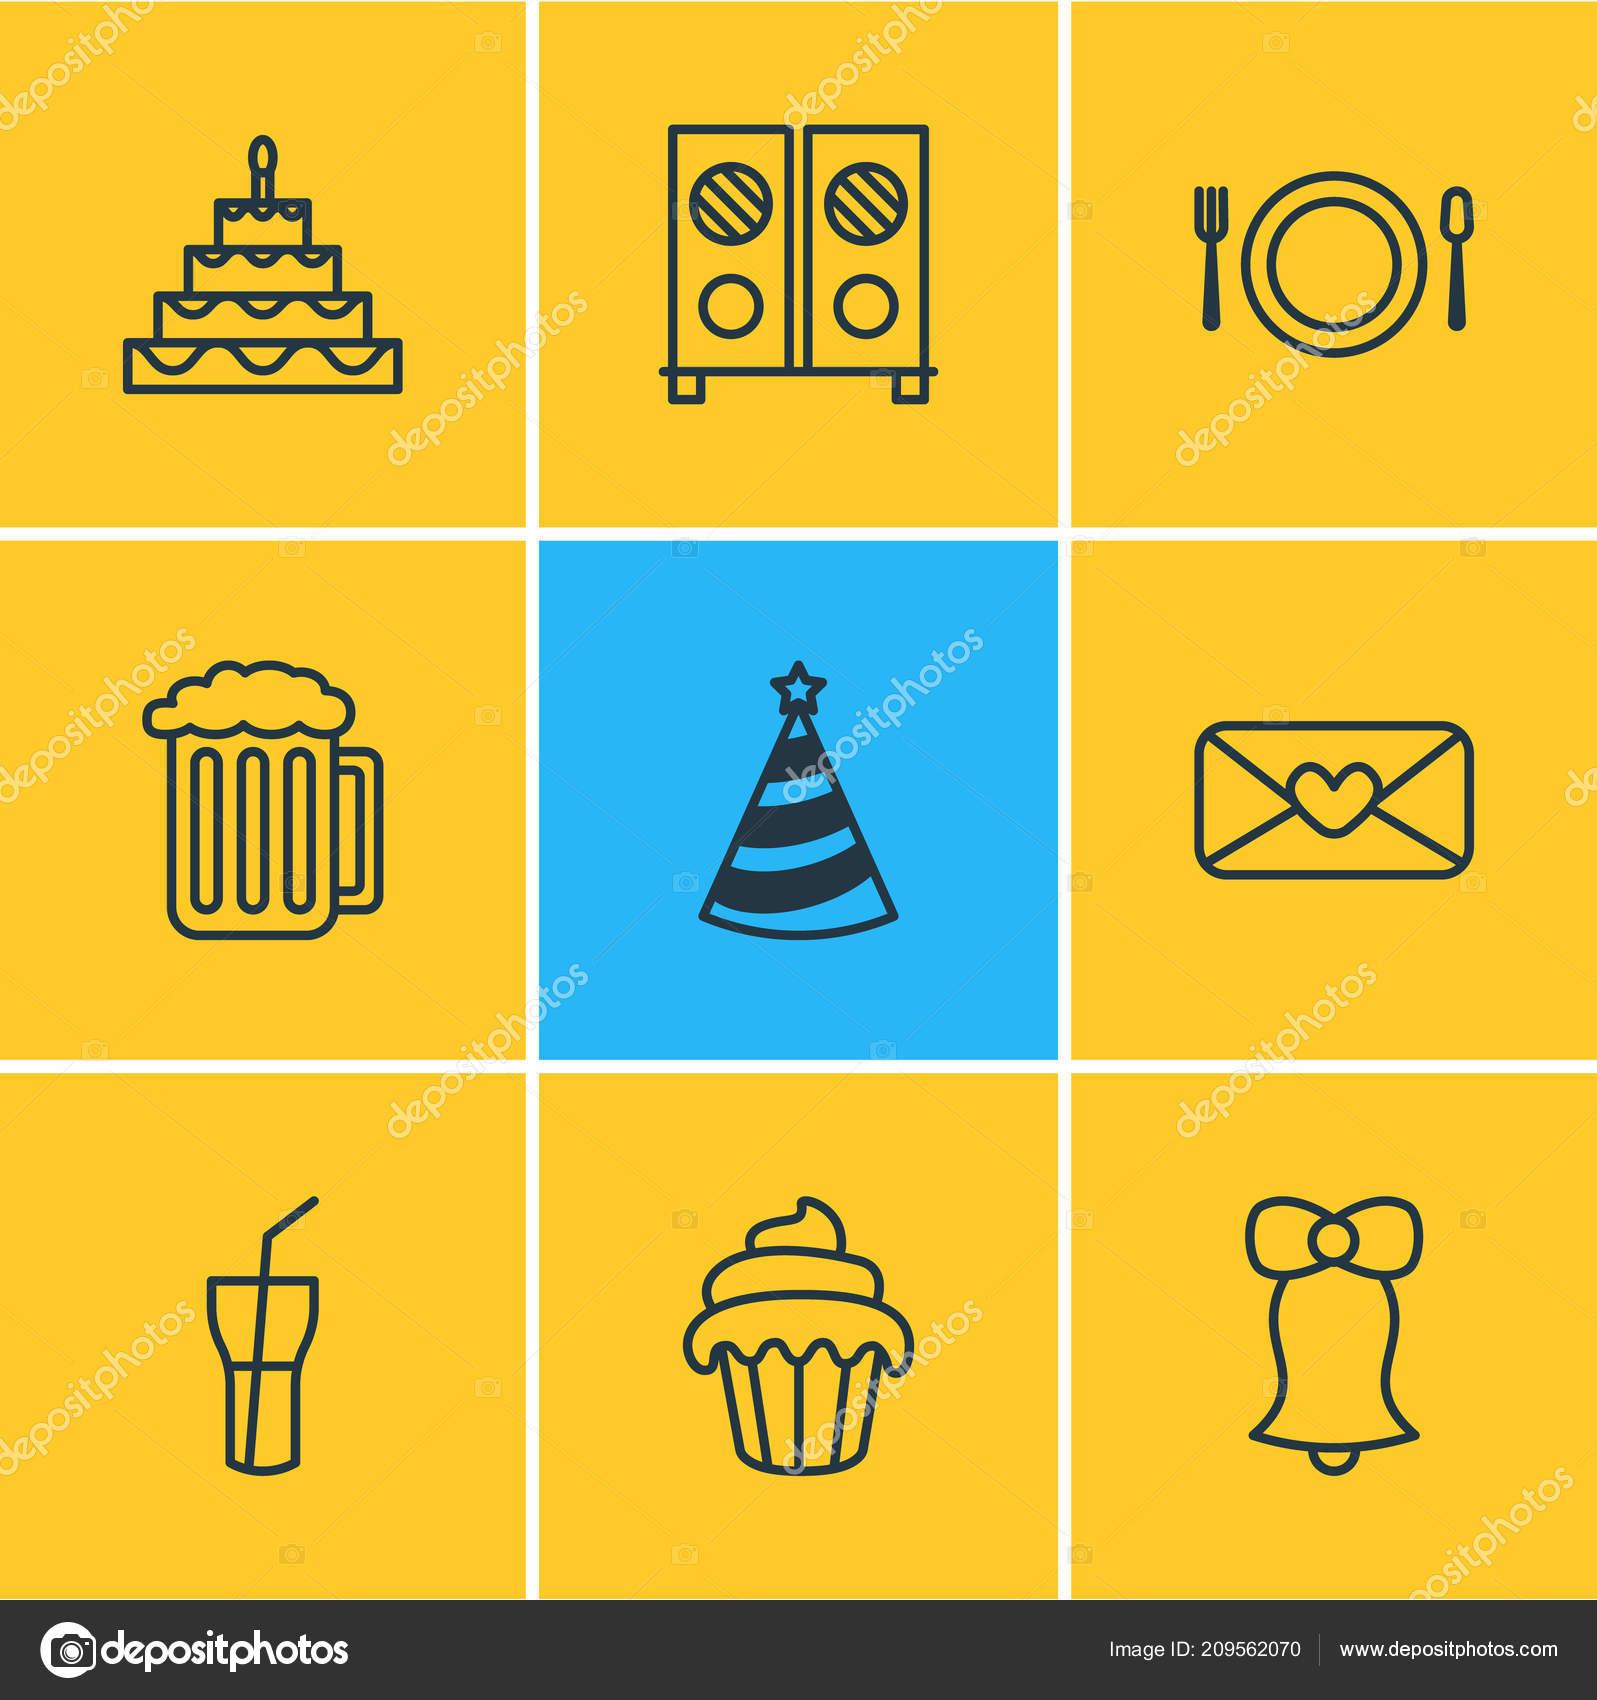 Vector illustration of 9 banquet icons line style. Editable set of soda 8b8860edda52